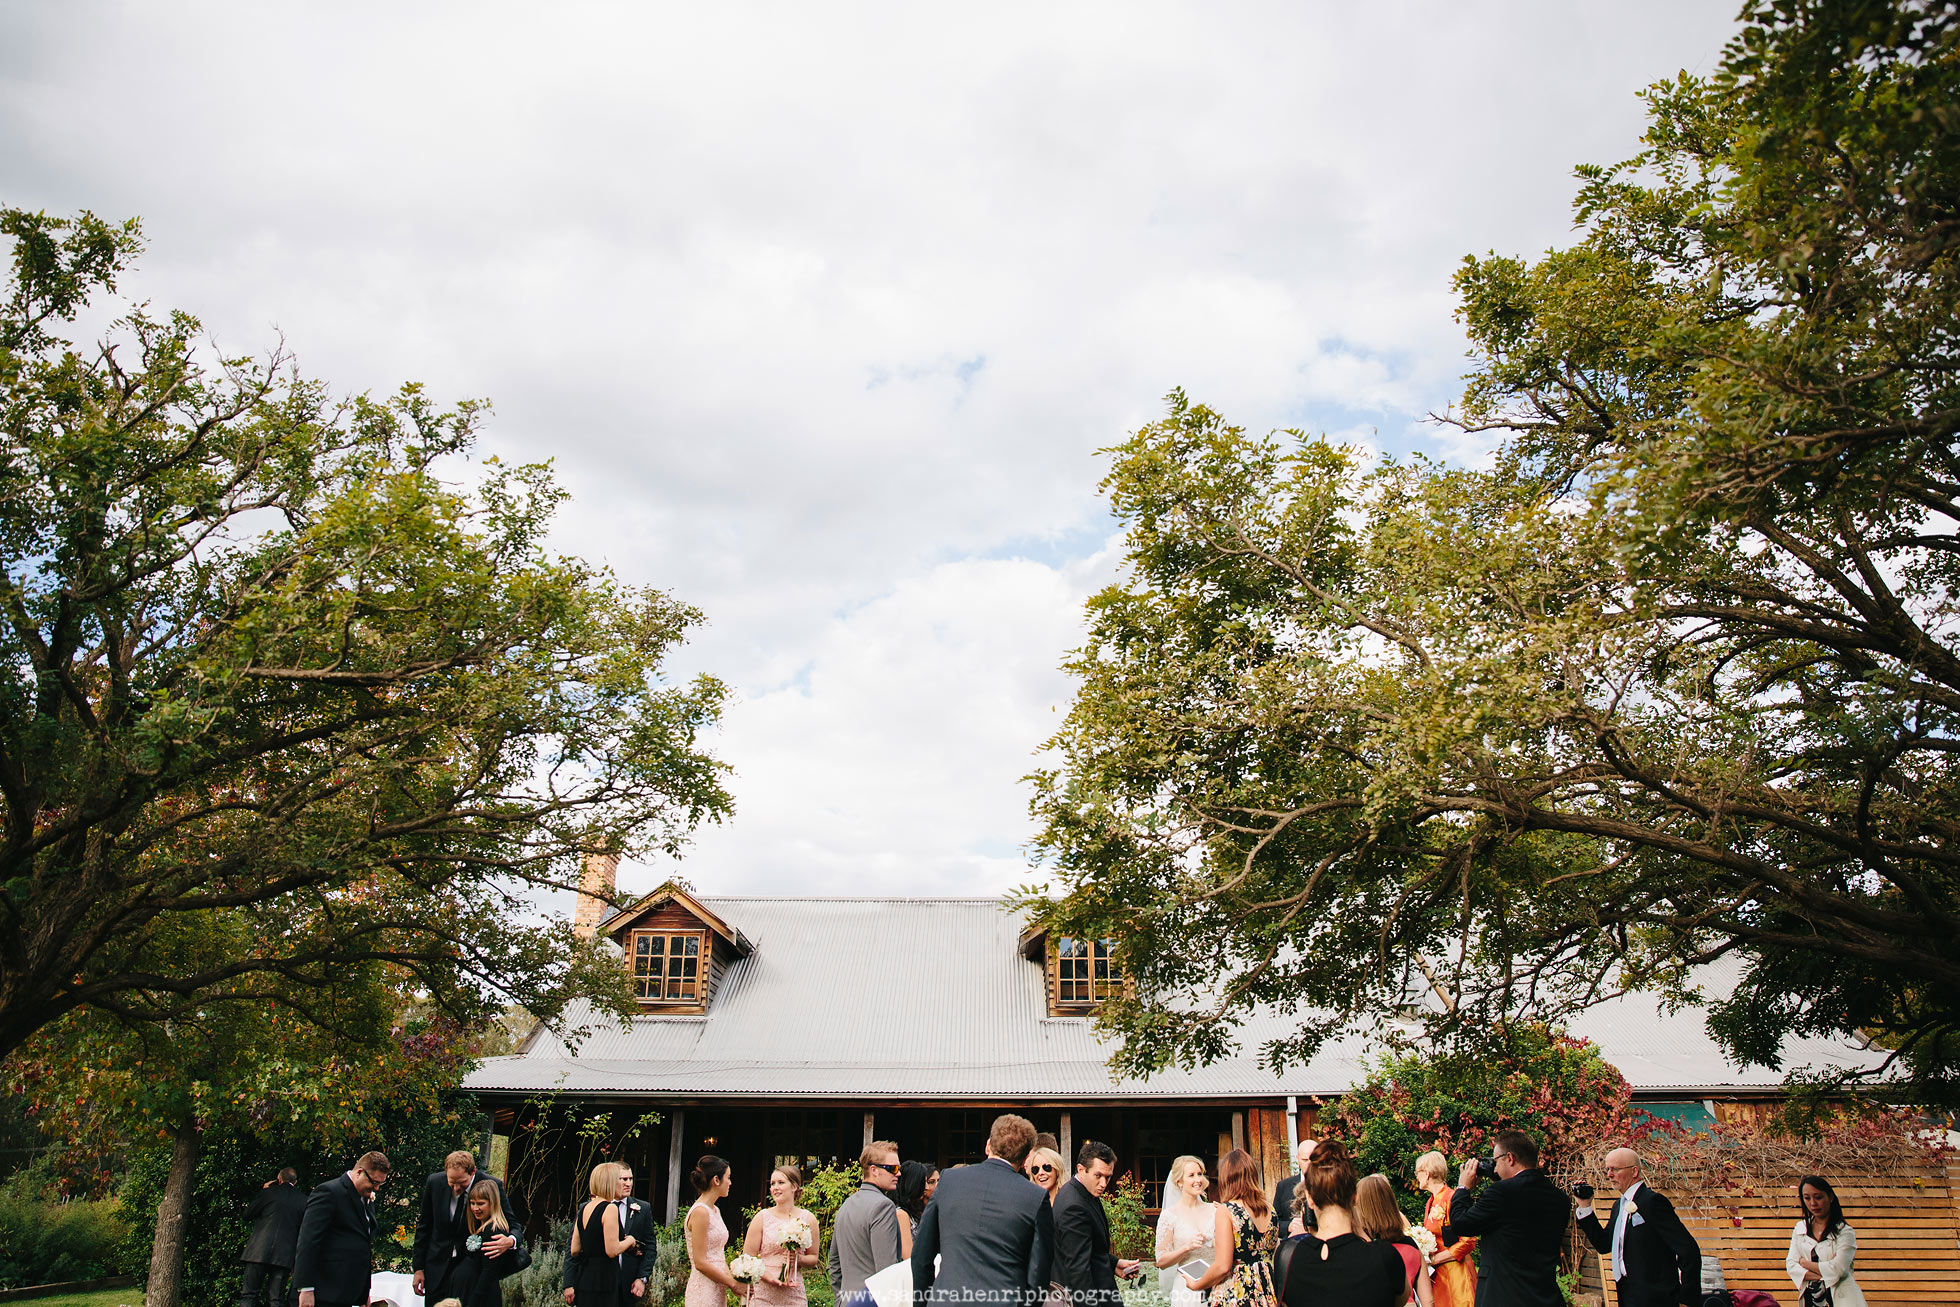 Roberts-Restaurant-garden-wedding-images-22.jpg